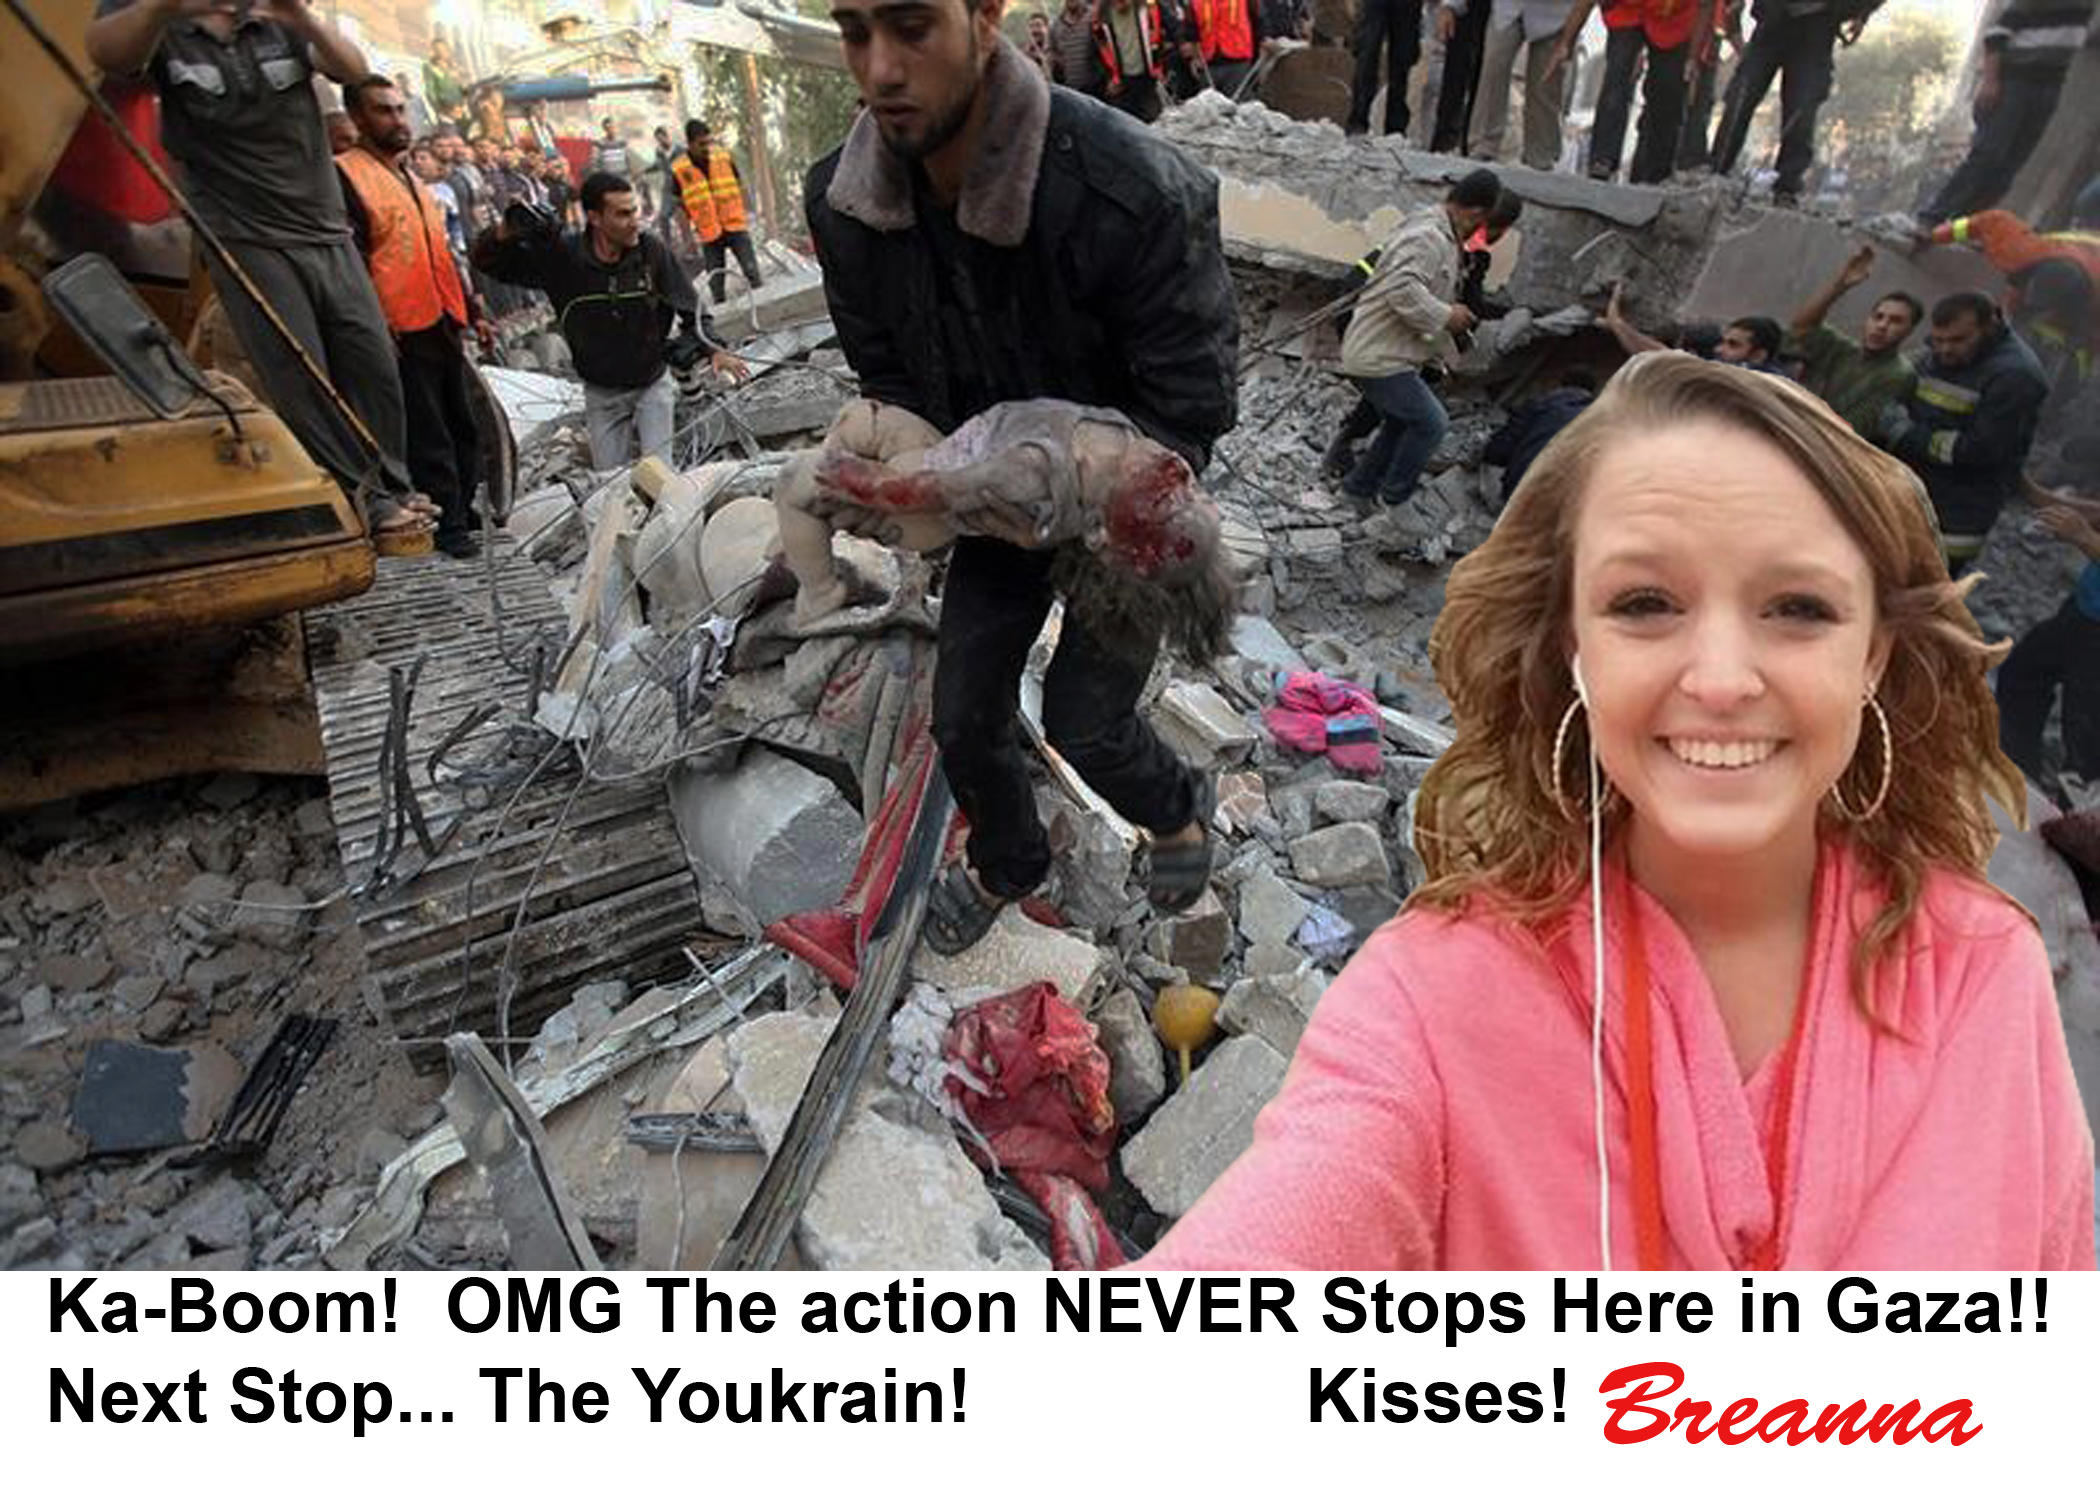 Having A Hot Time In Gaza Love Breanna Auschwitz Selfie Know Your Meme